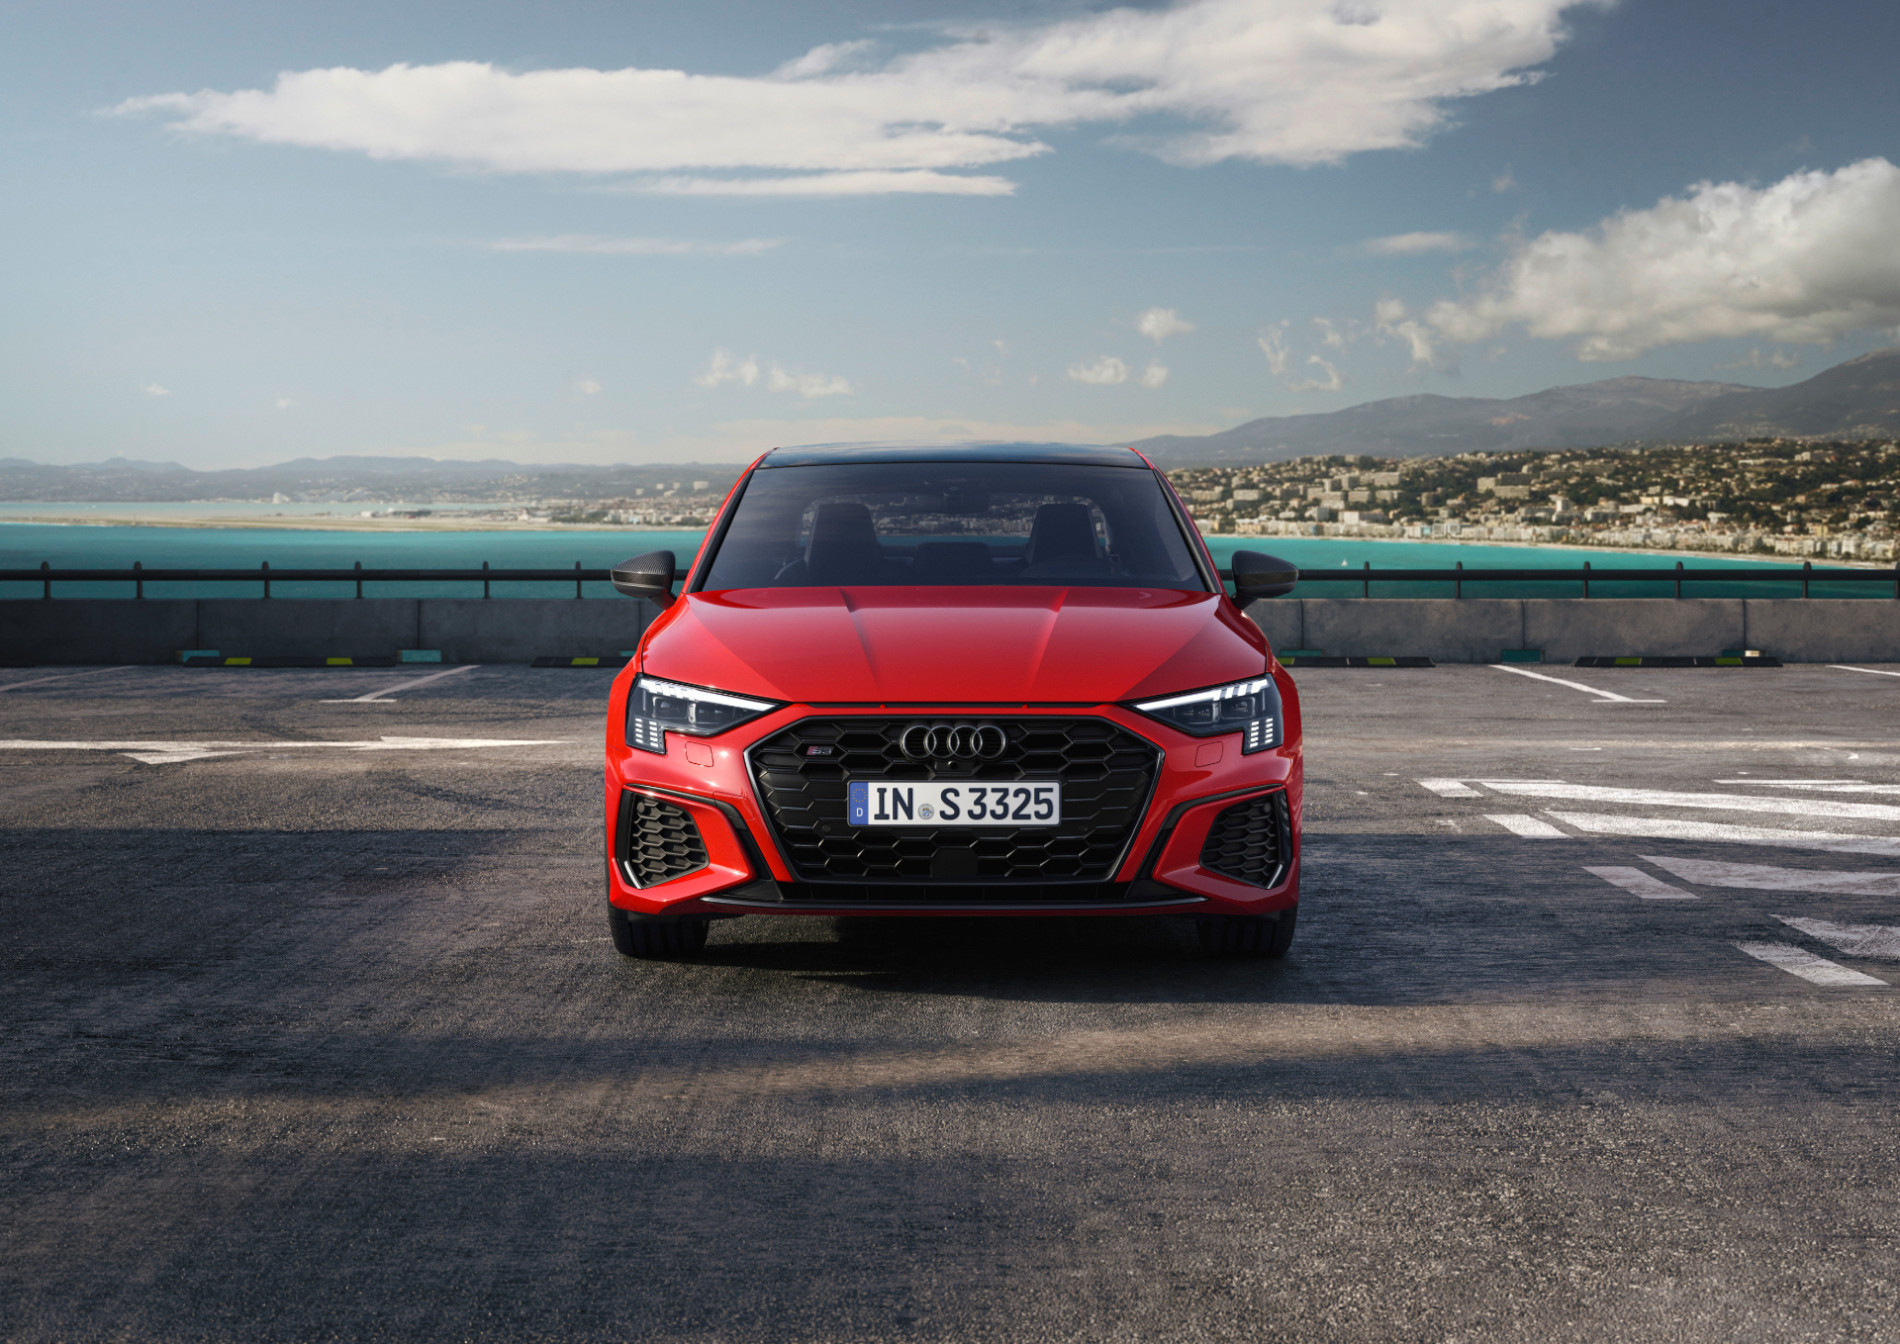 Noul Audi S3 - Noul Audi S3